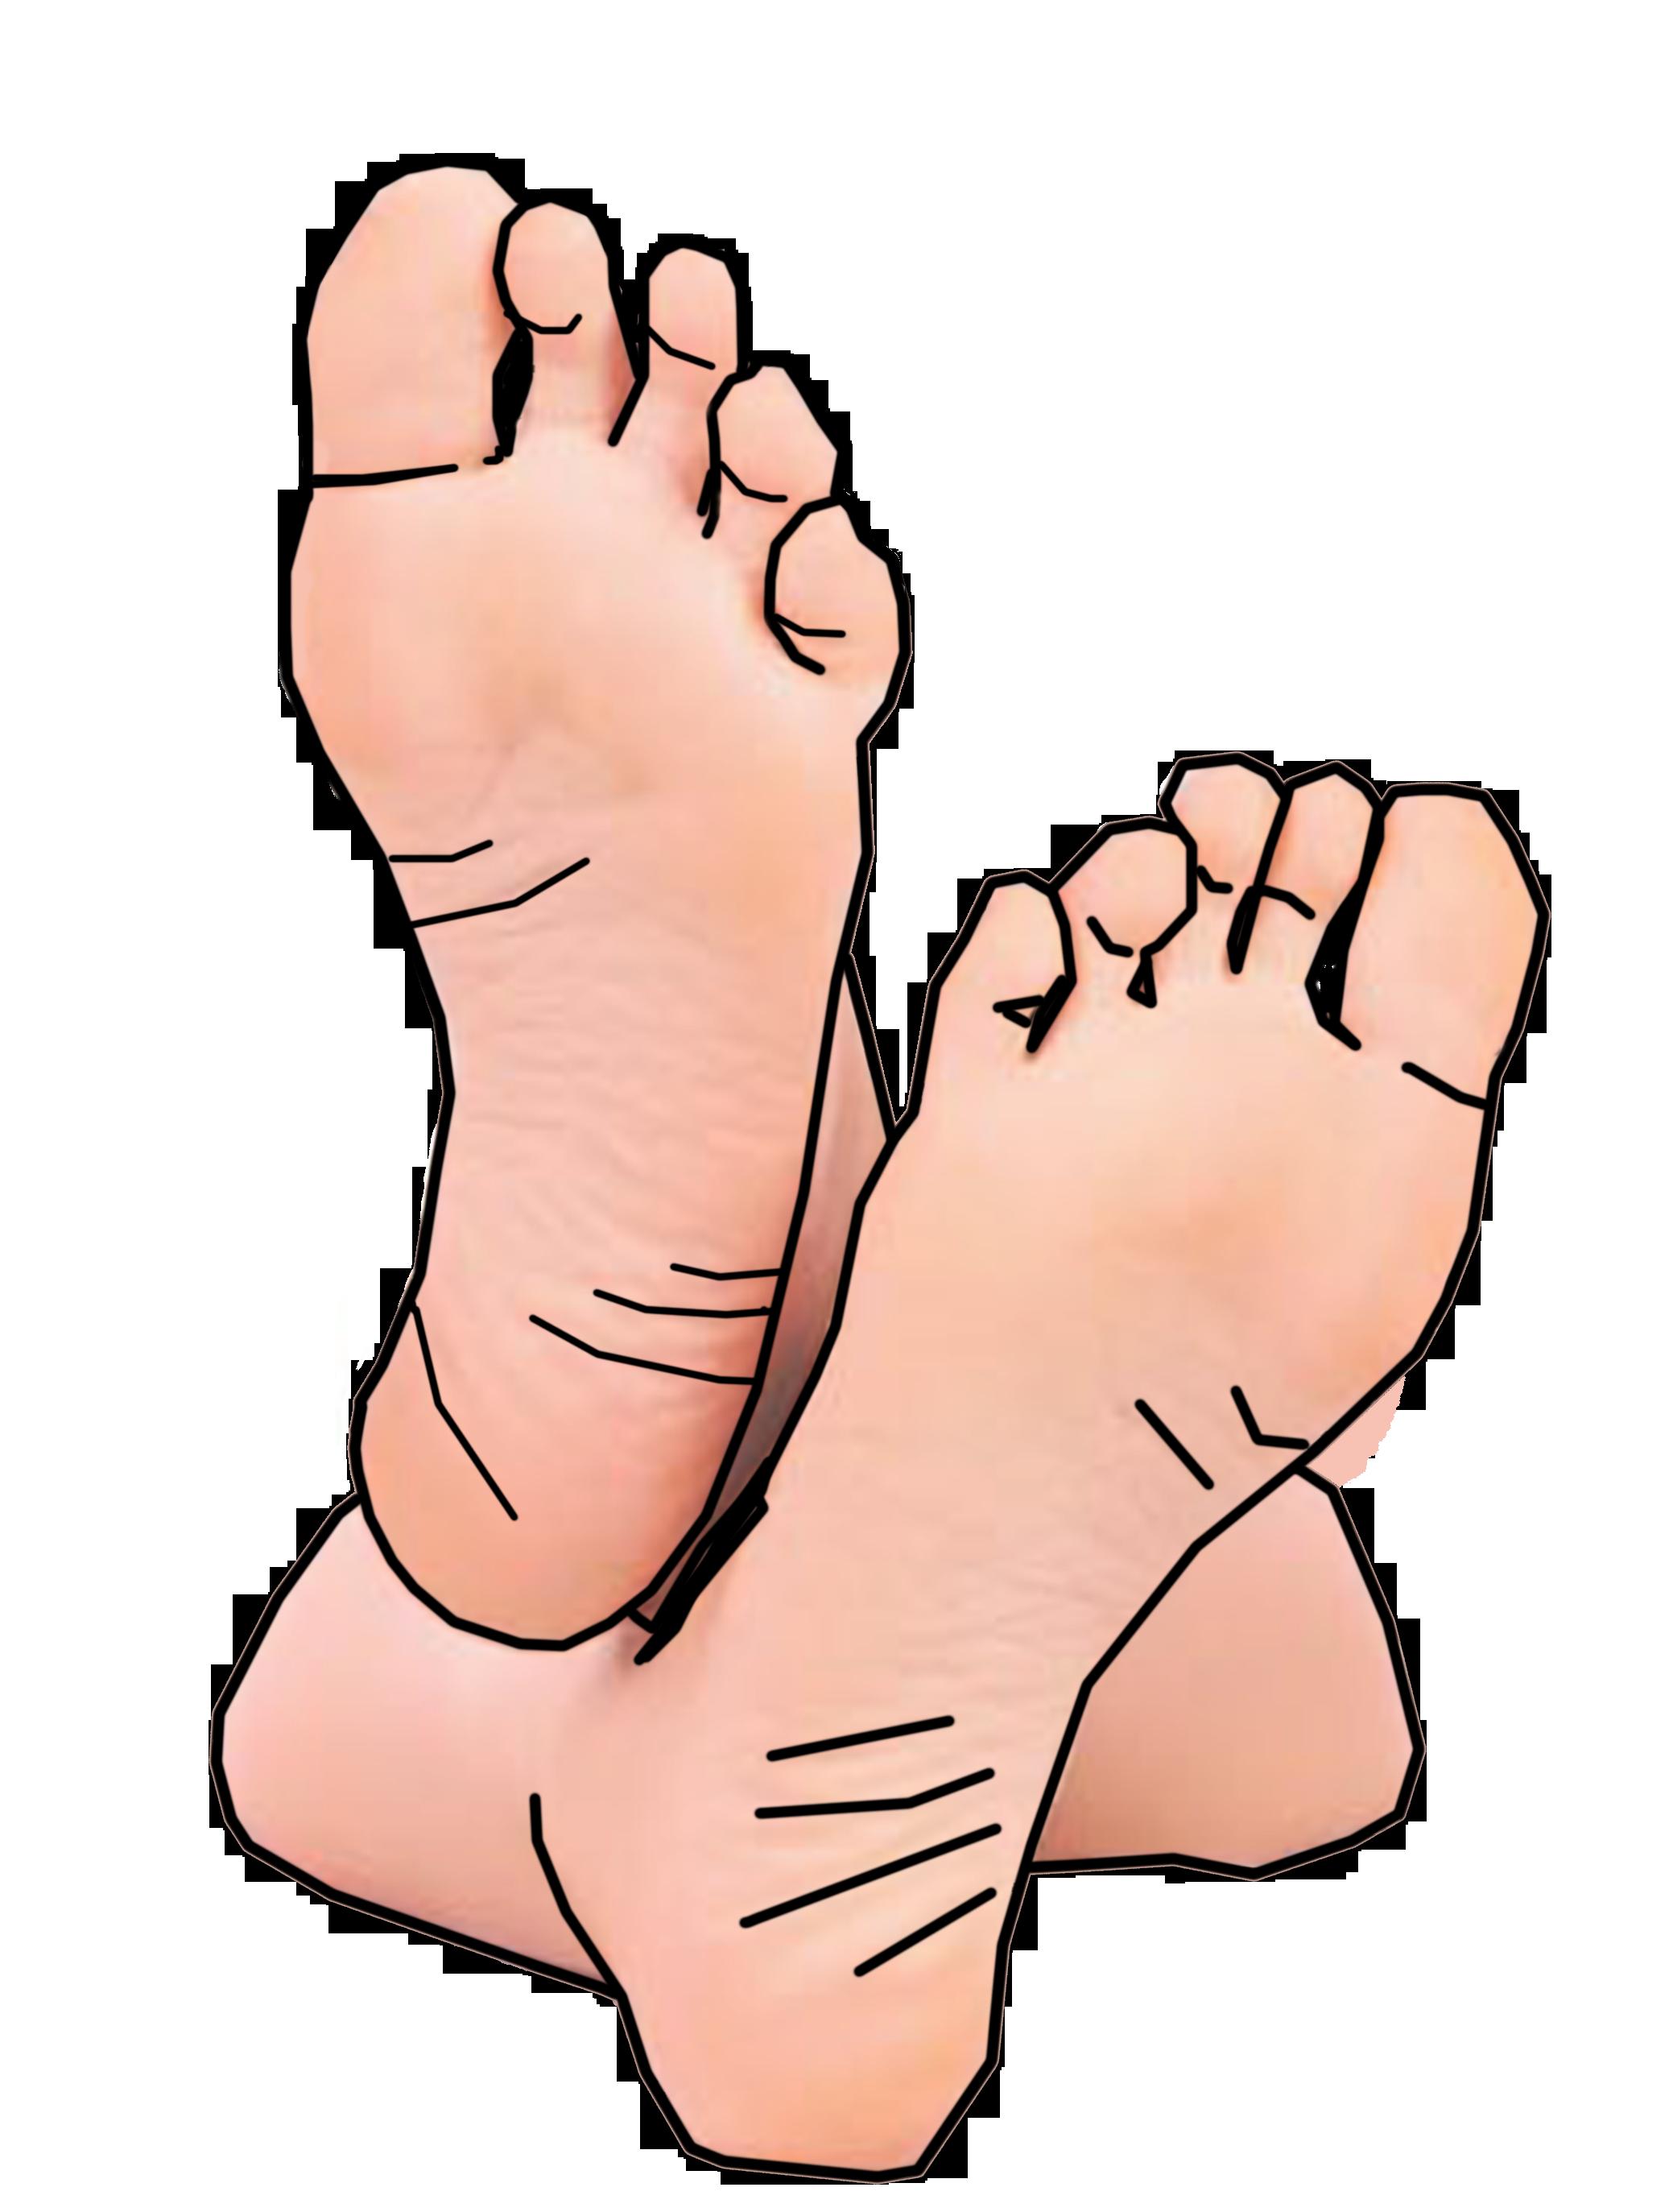 Clip Art Foot Clip Art feet and toes clipart kid feetsies free images at clker com vector clip art online royalty